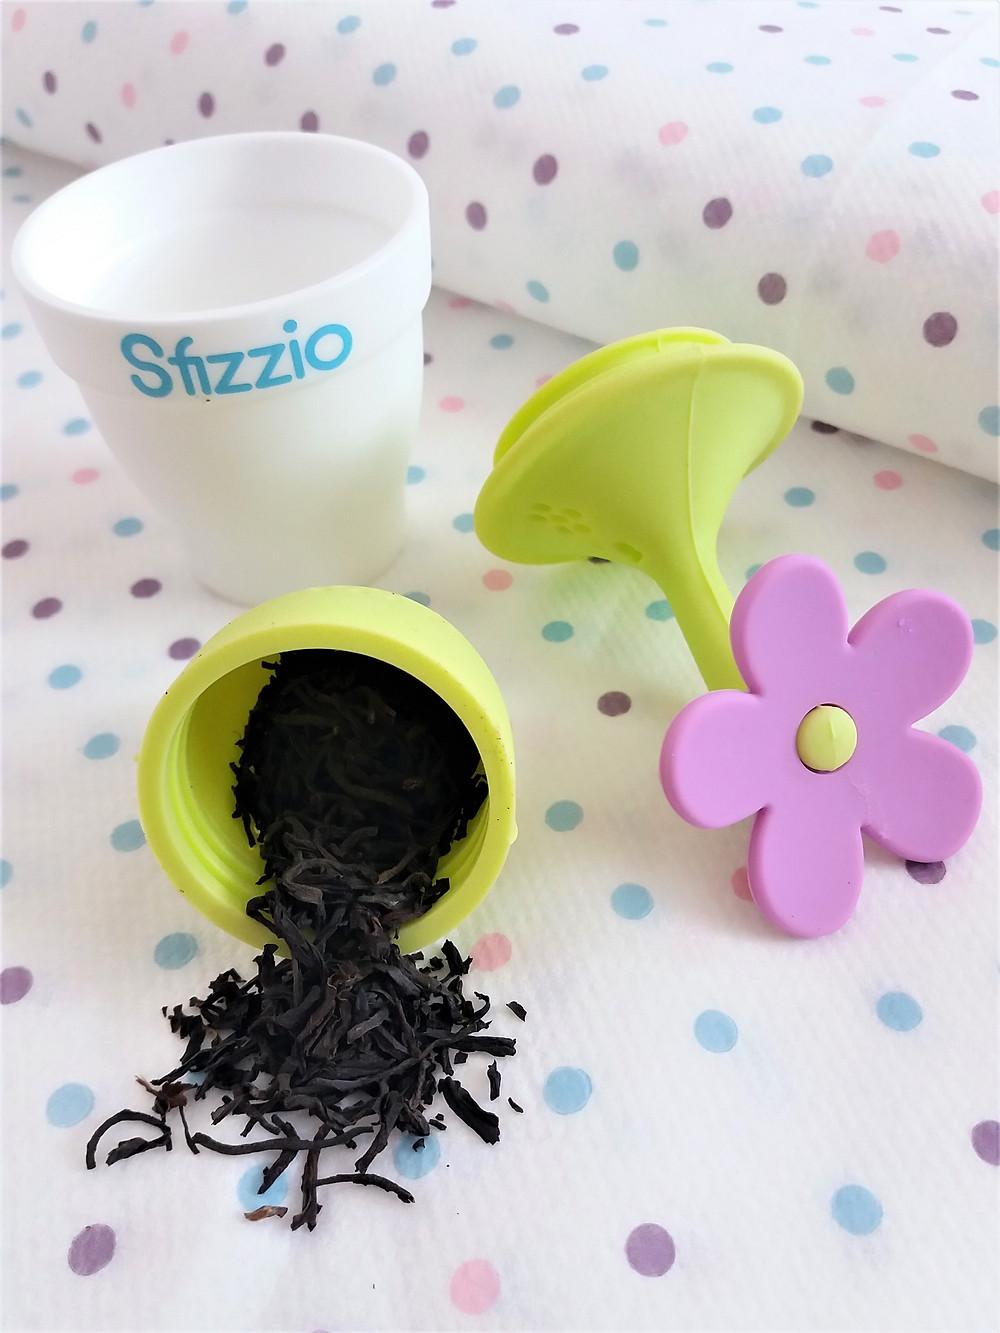 Close up image of Sfizzio Tea Infuser parts and loose tea.